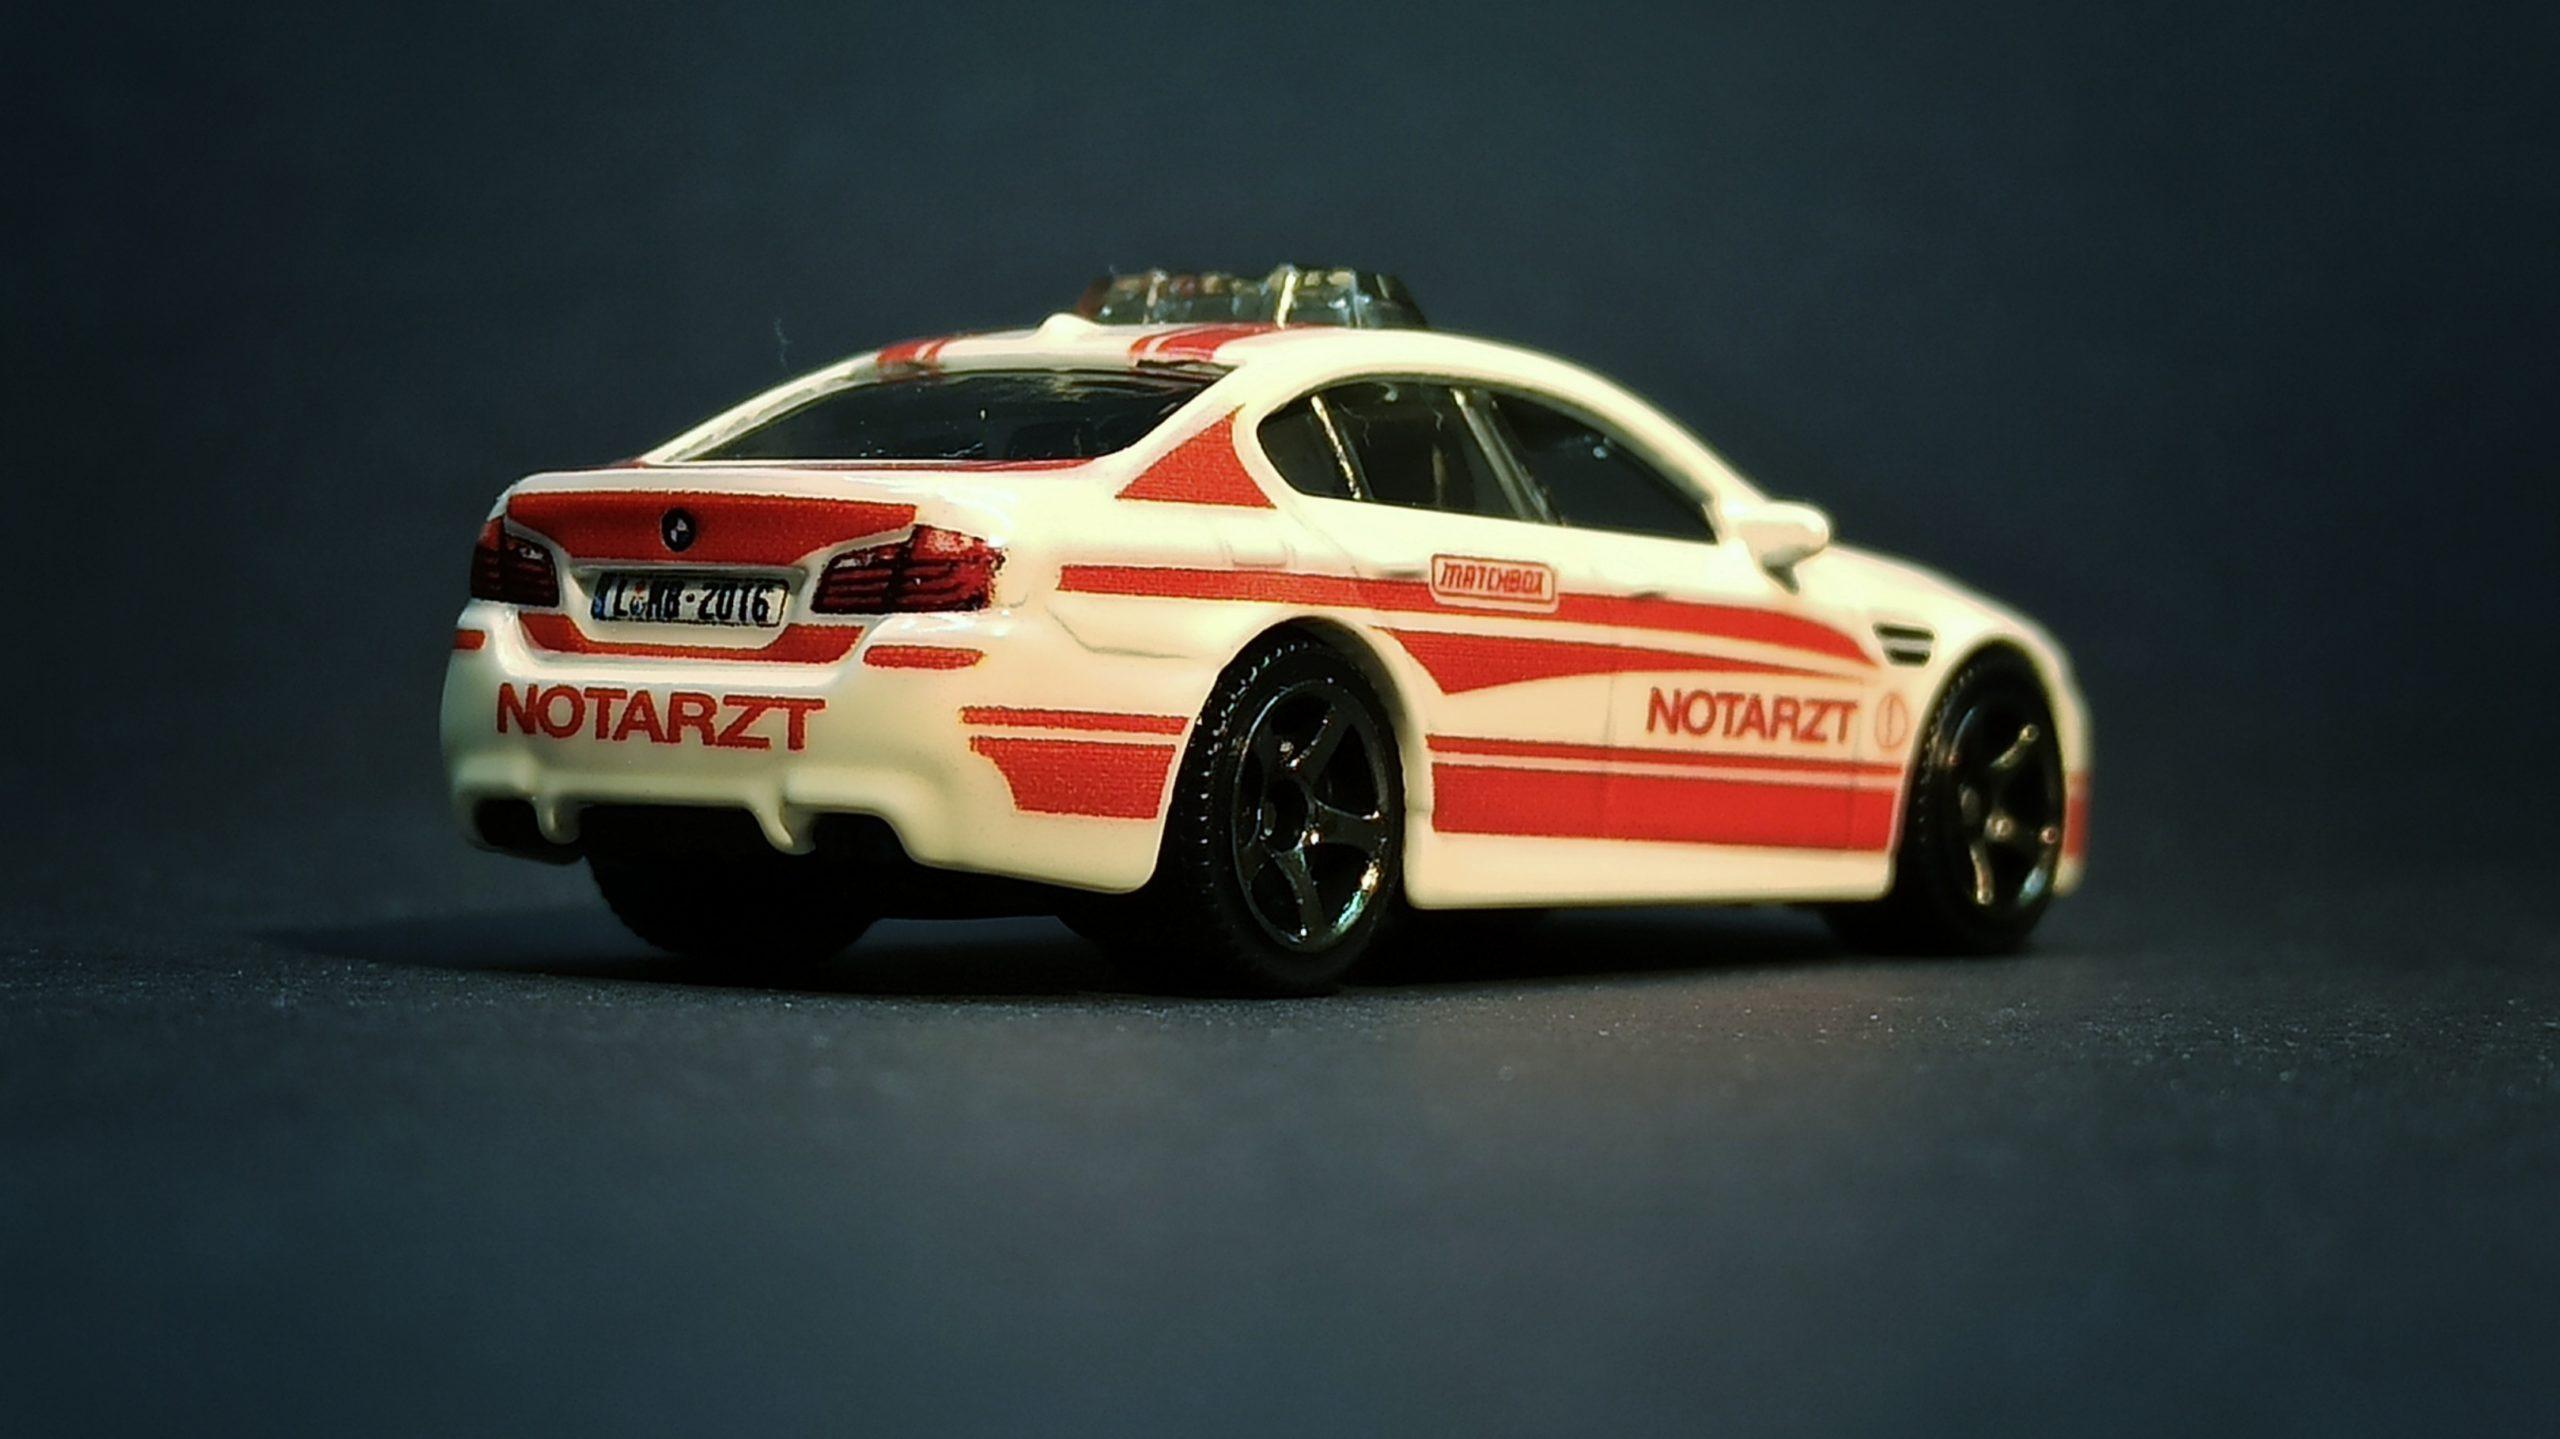 "Matchbox BMW M5 Police 2016 Toy Fair ""Modell Hobby Spiel"" Leipzig white MBX Notarzt side angle"